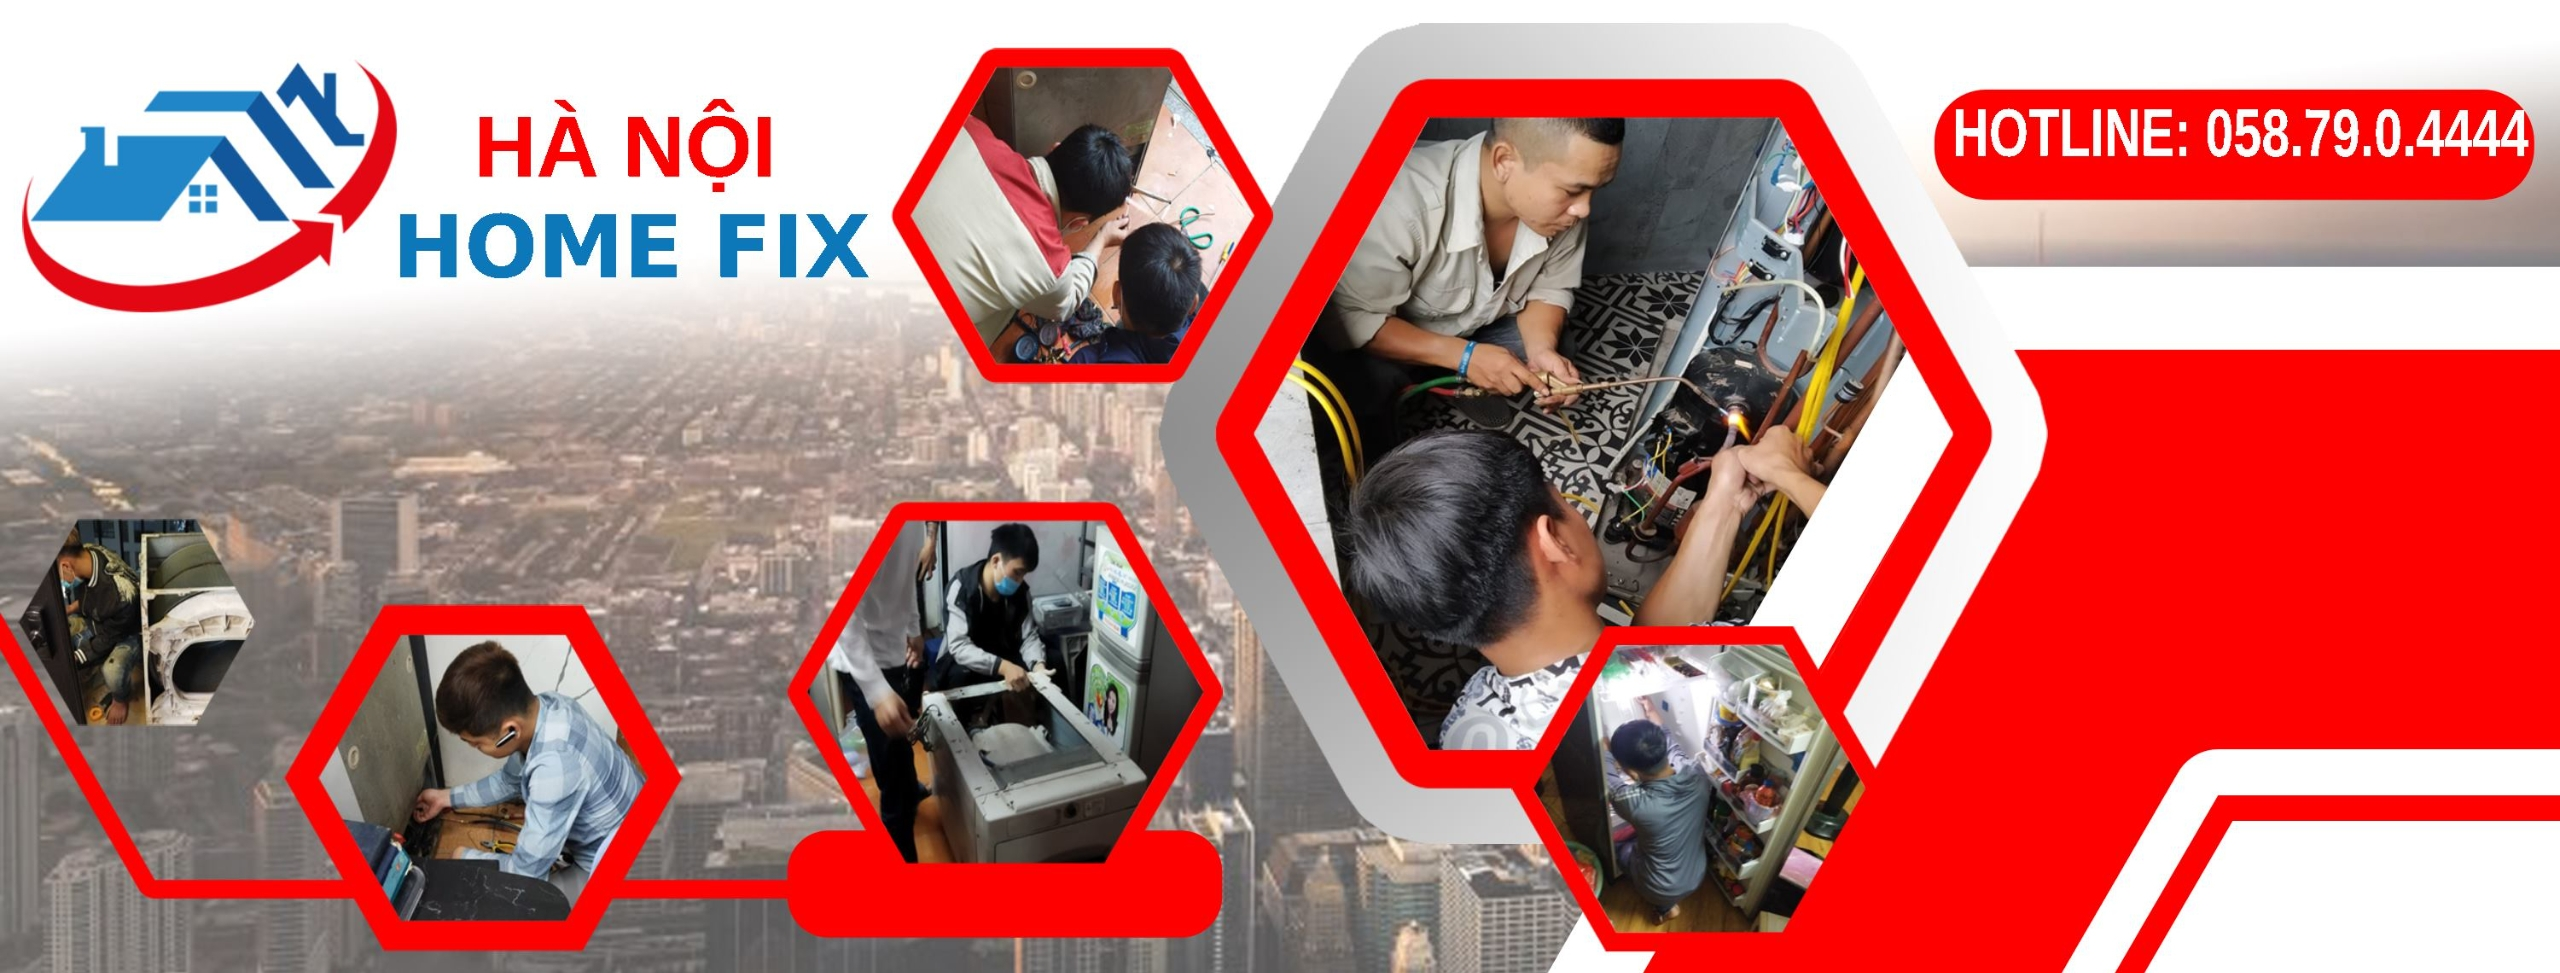 hanoihomefix (@hanoihomefix) Cover Image